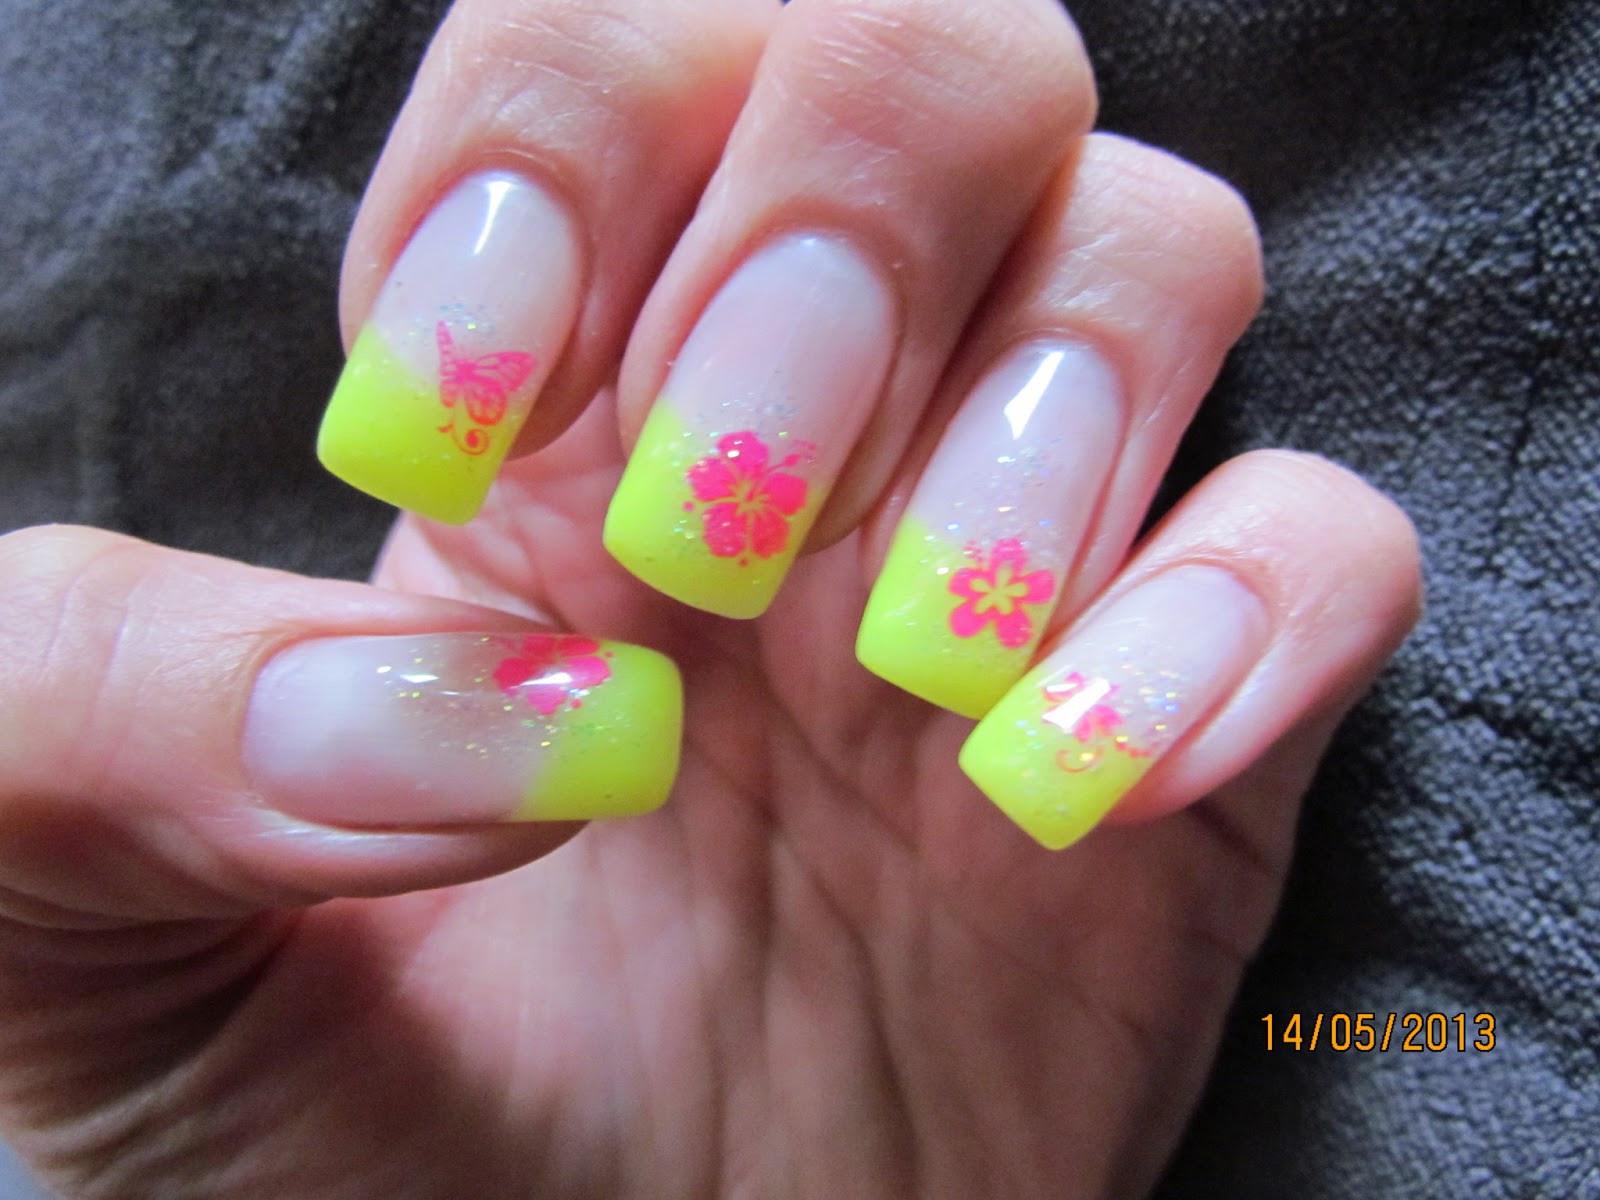 Nageldesign Sommer Neon  Nageldesign Neonfarben